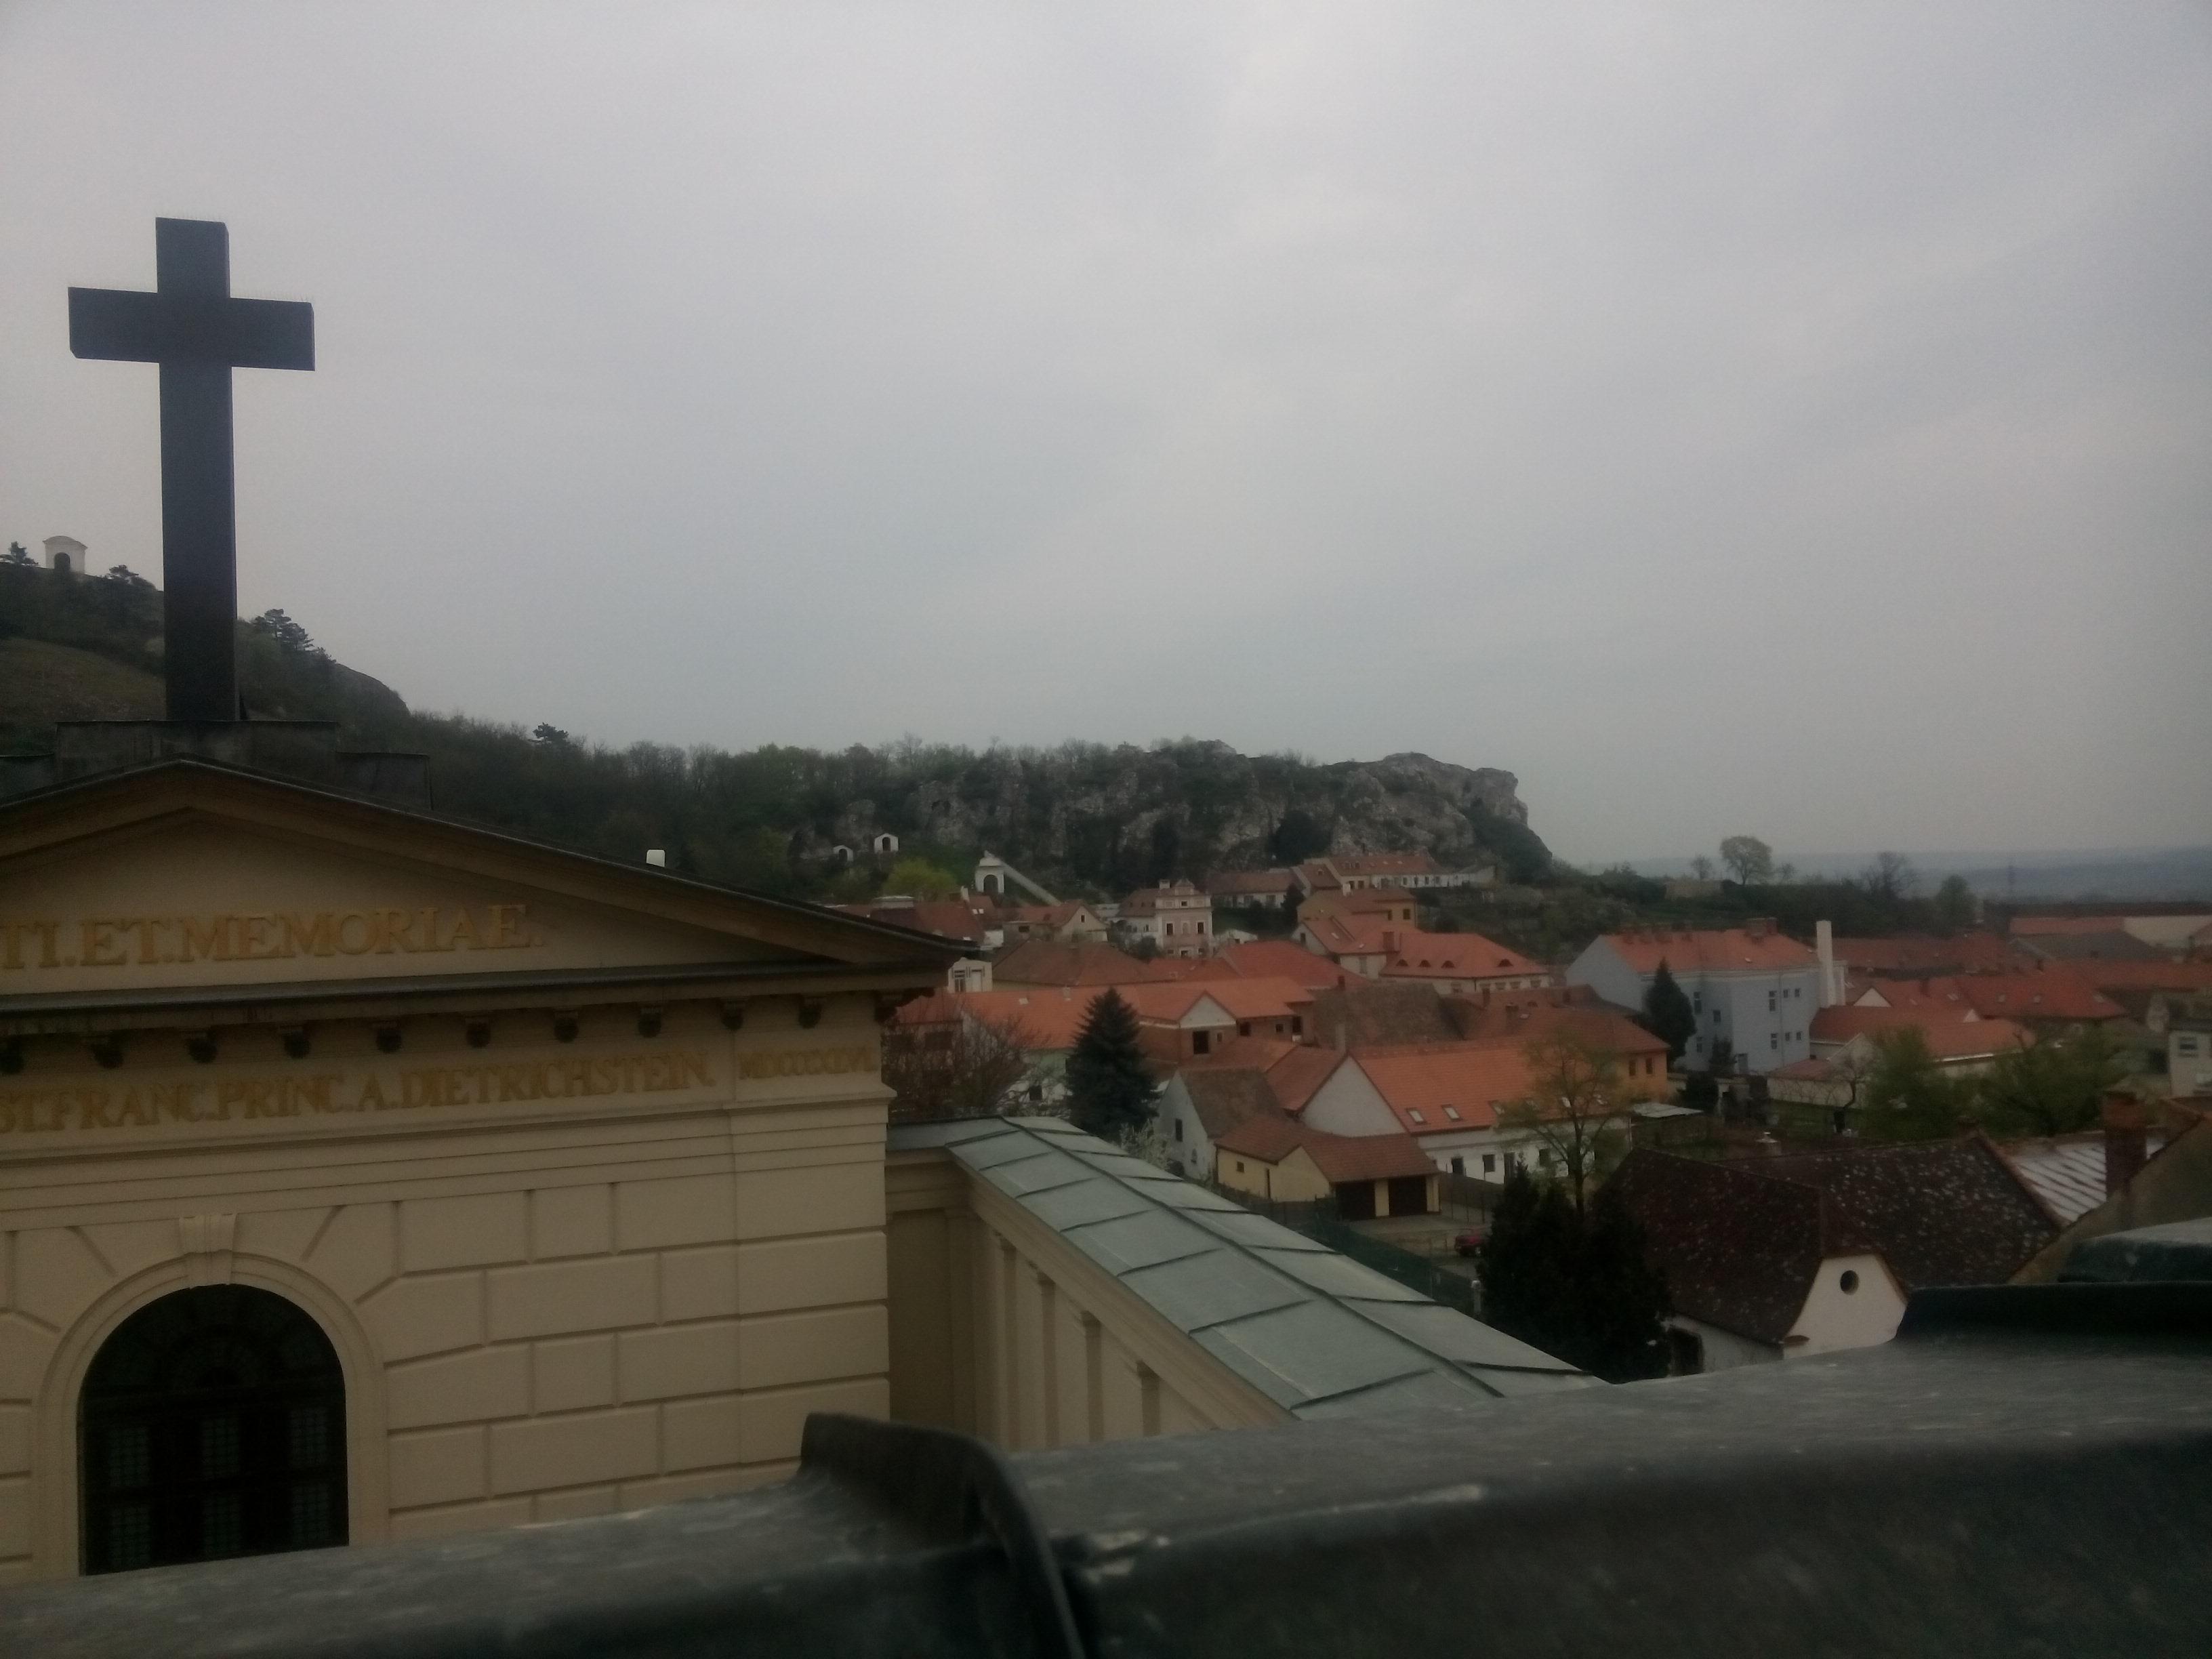 https://i.amy.gy/201804-slovakia-austria-czech/IMG_20180416_161947.jpg